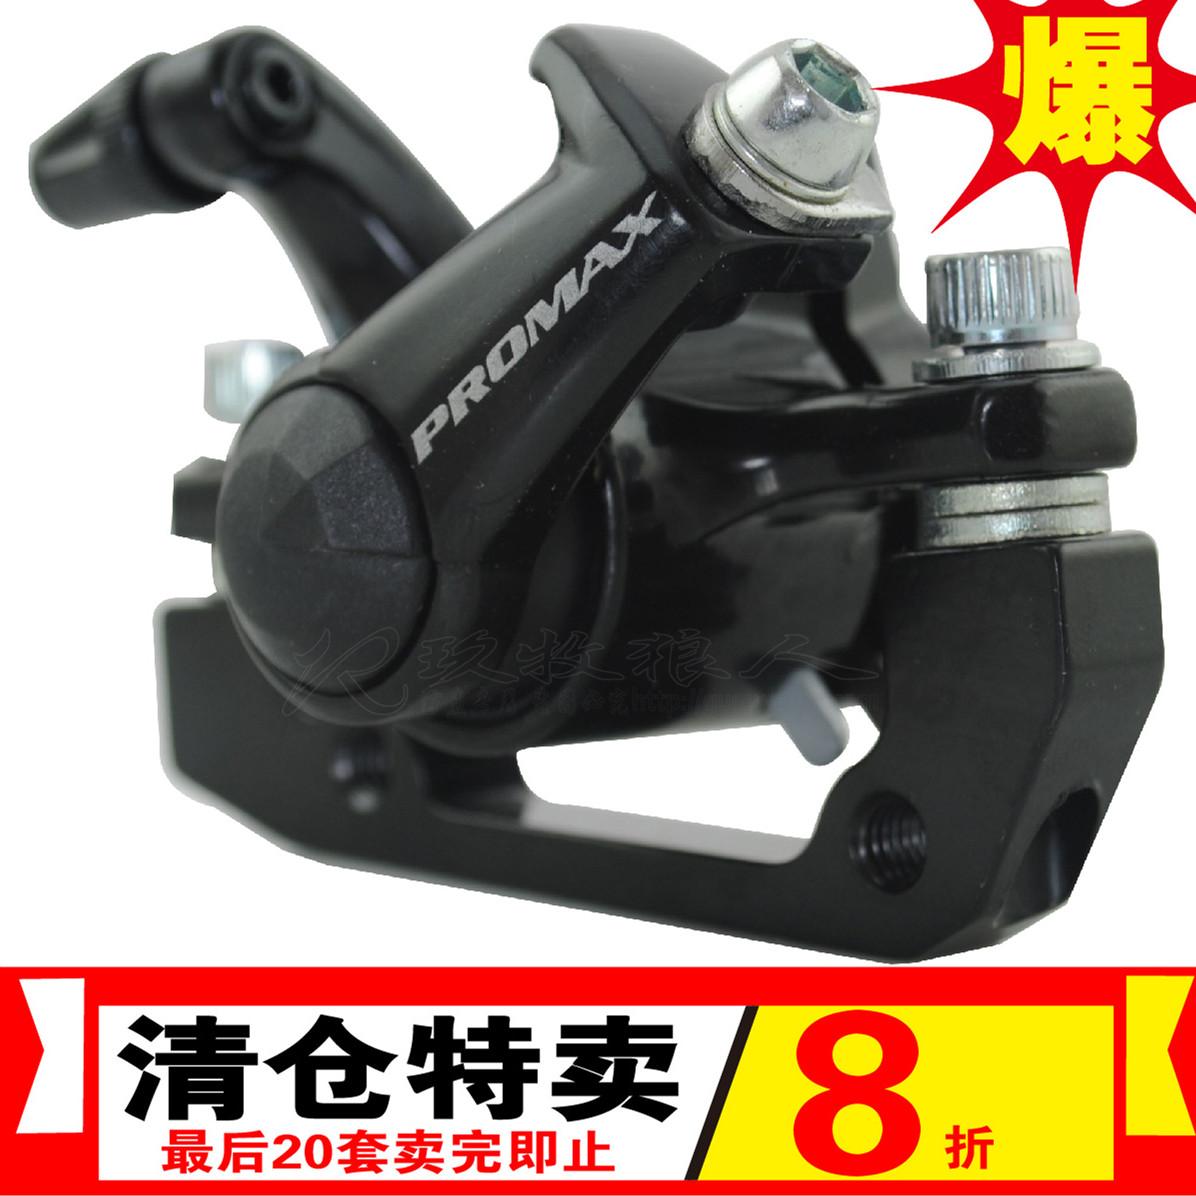 Тормоза для велосипеда Leach DC320 PROMAX